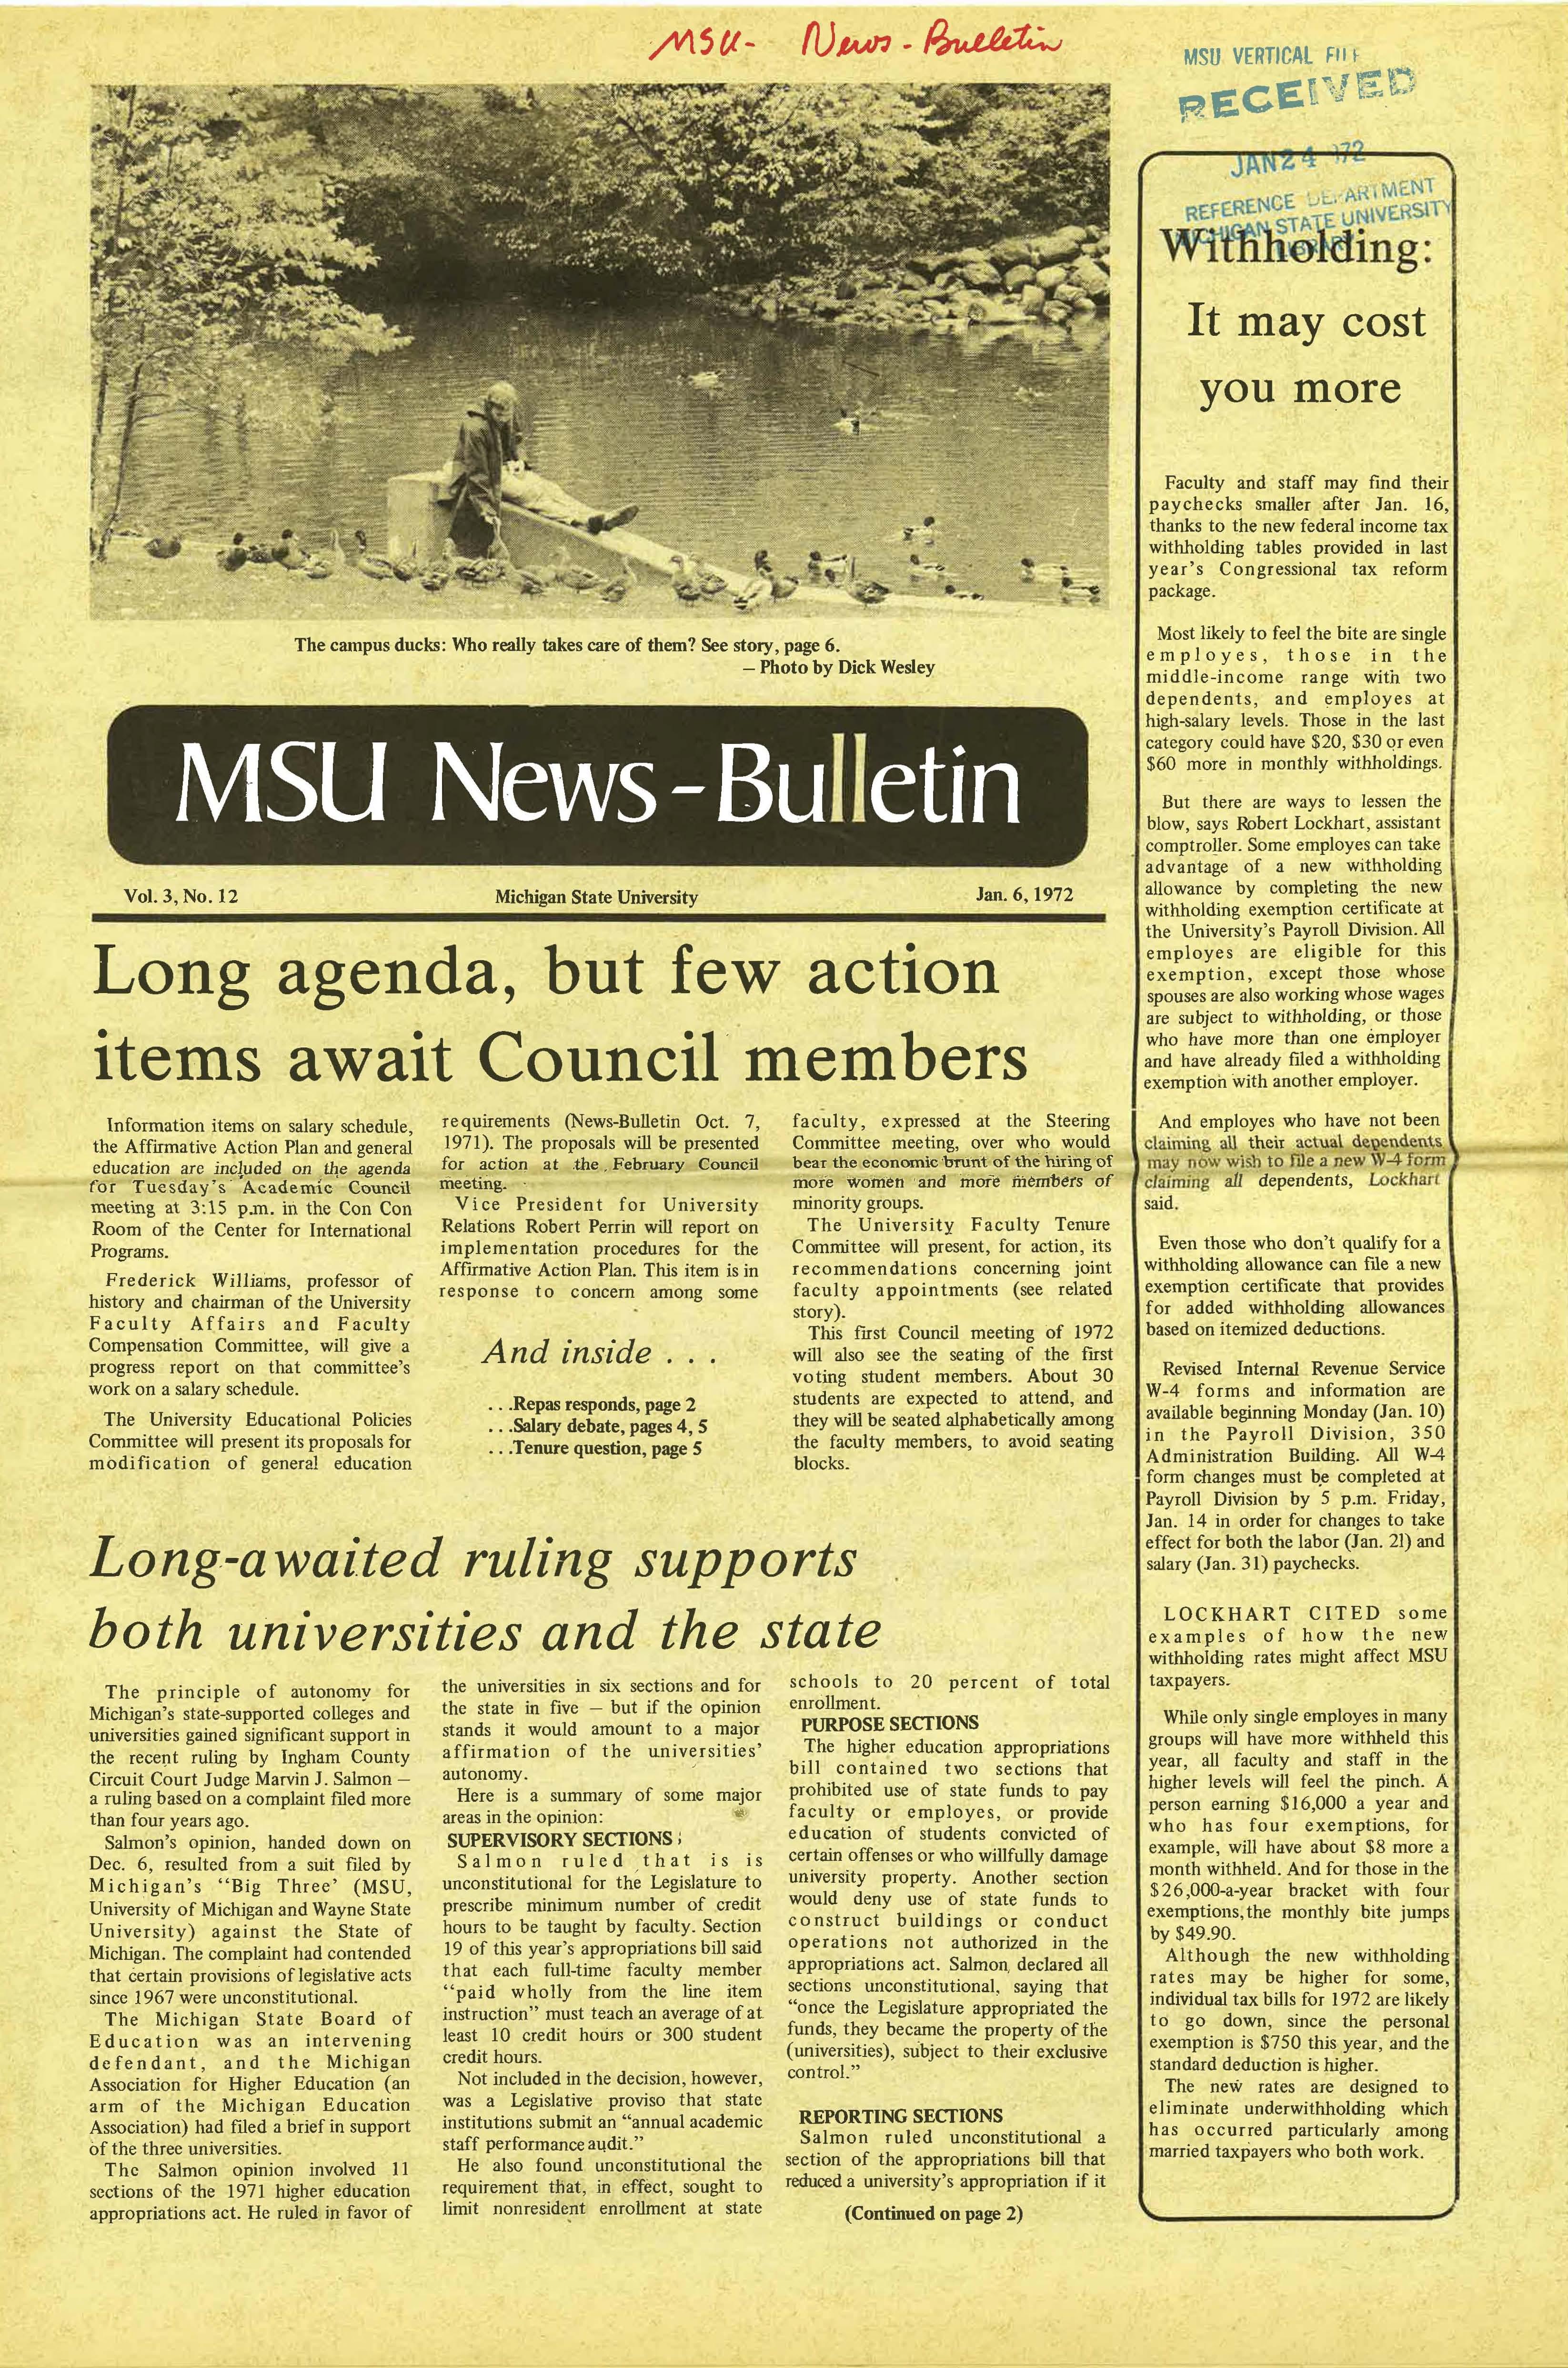 MSU News Bulletin, vol. 4, No. 01, September 21, 1972